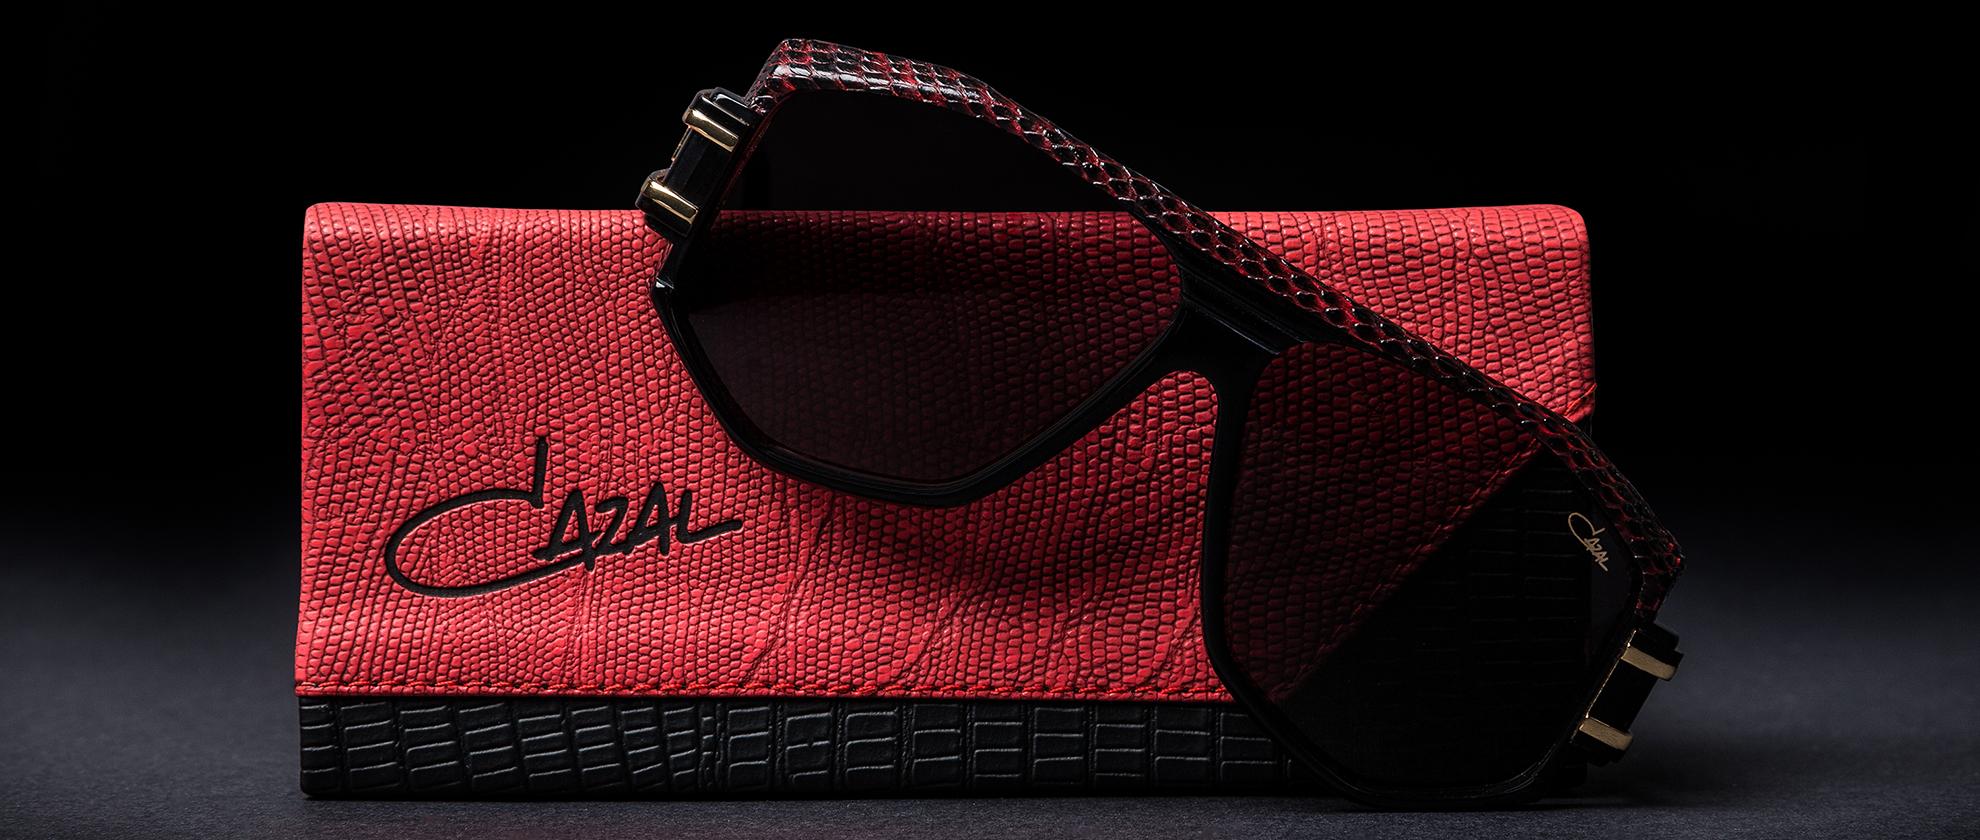 Cazal Legends Limited Edition 163/3 Sunglasses